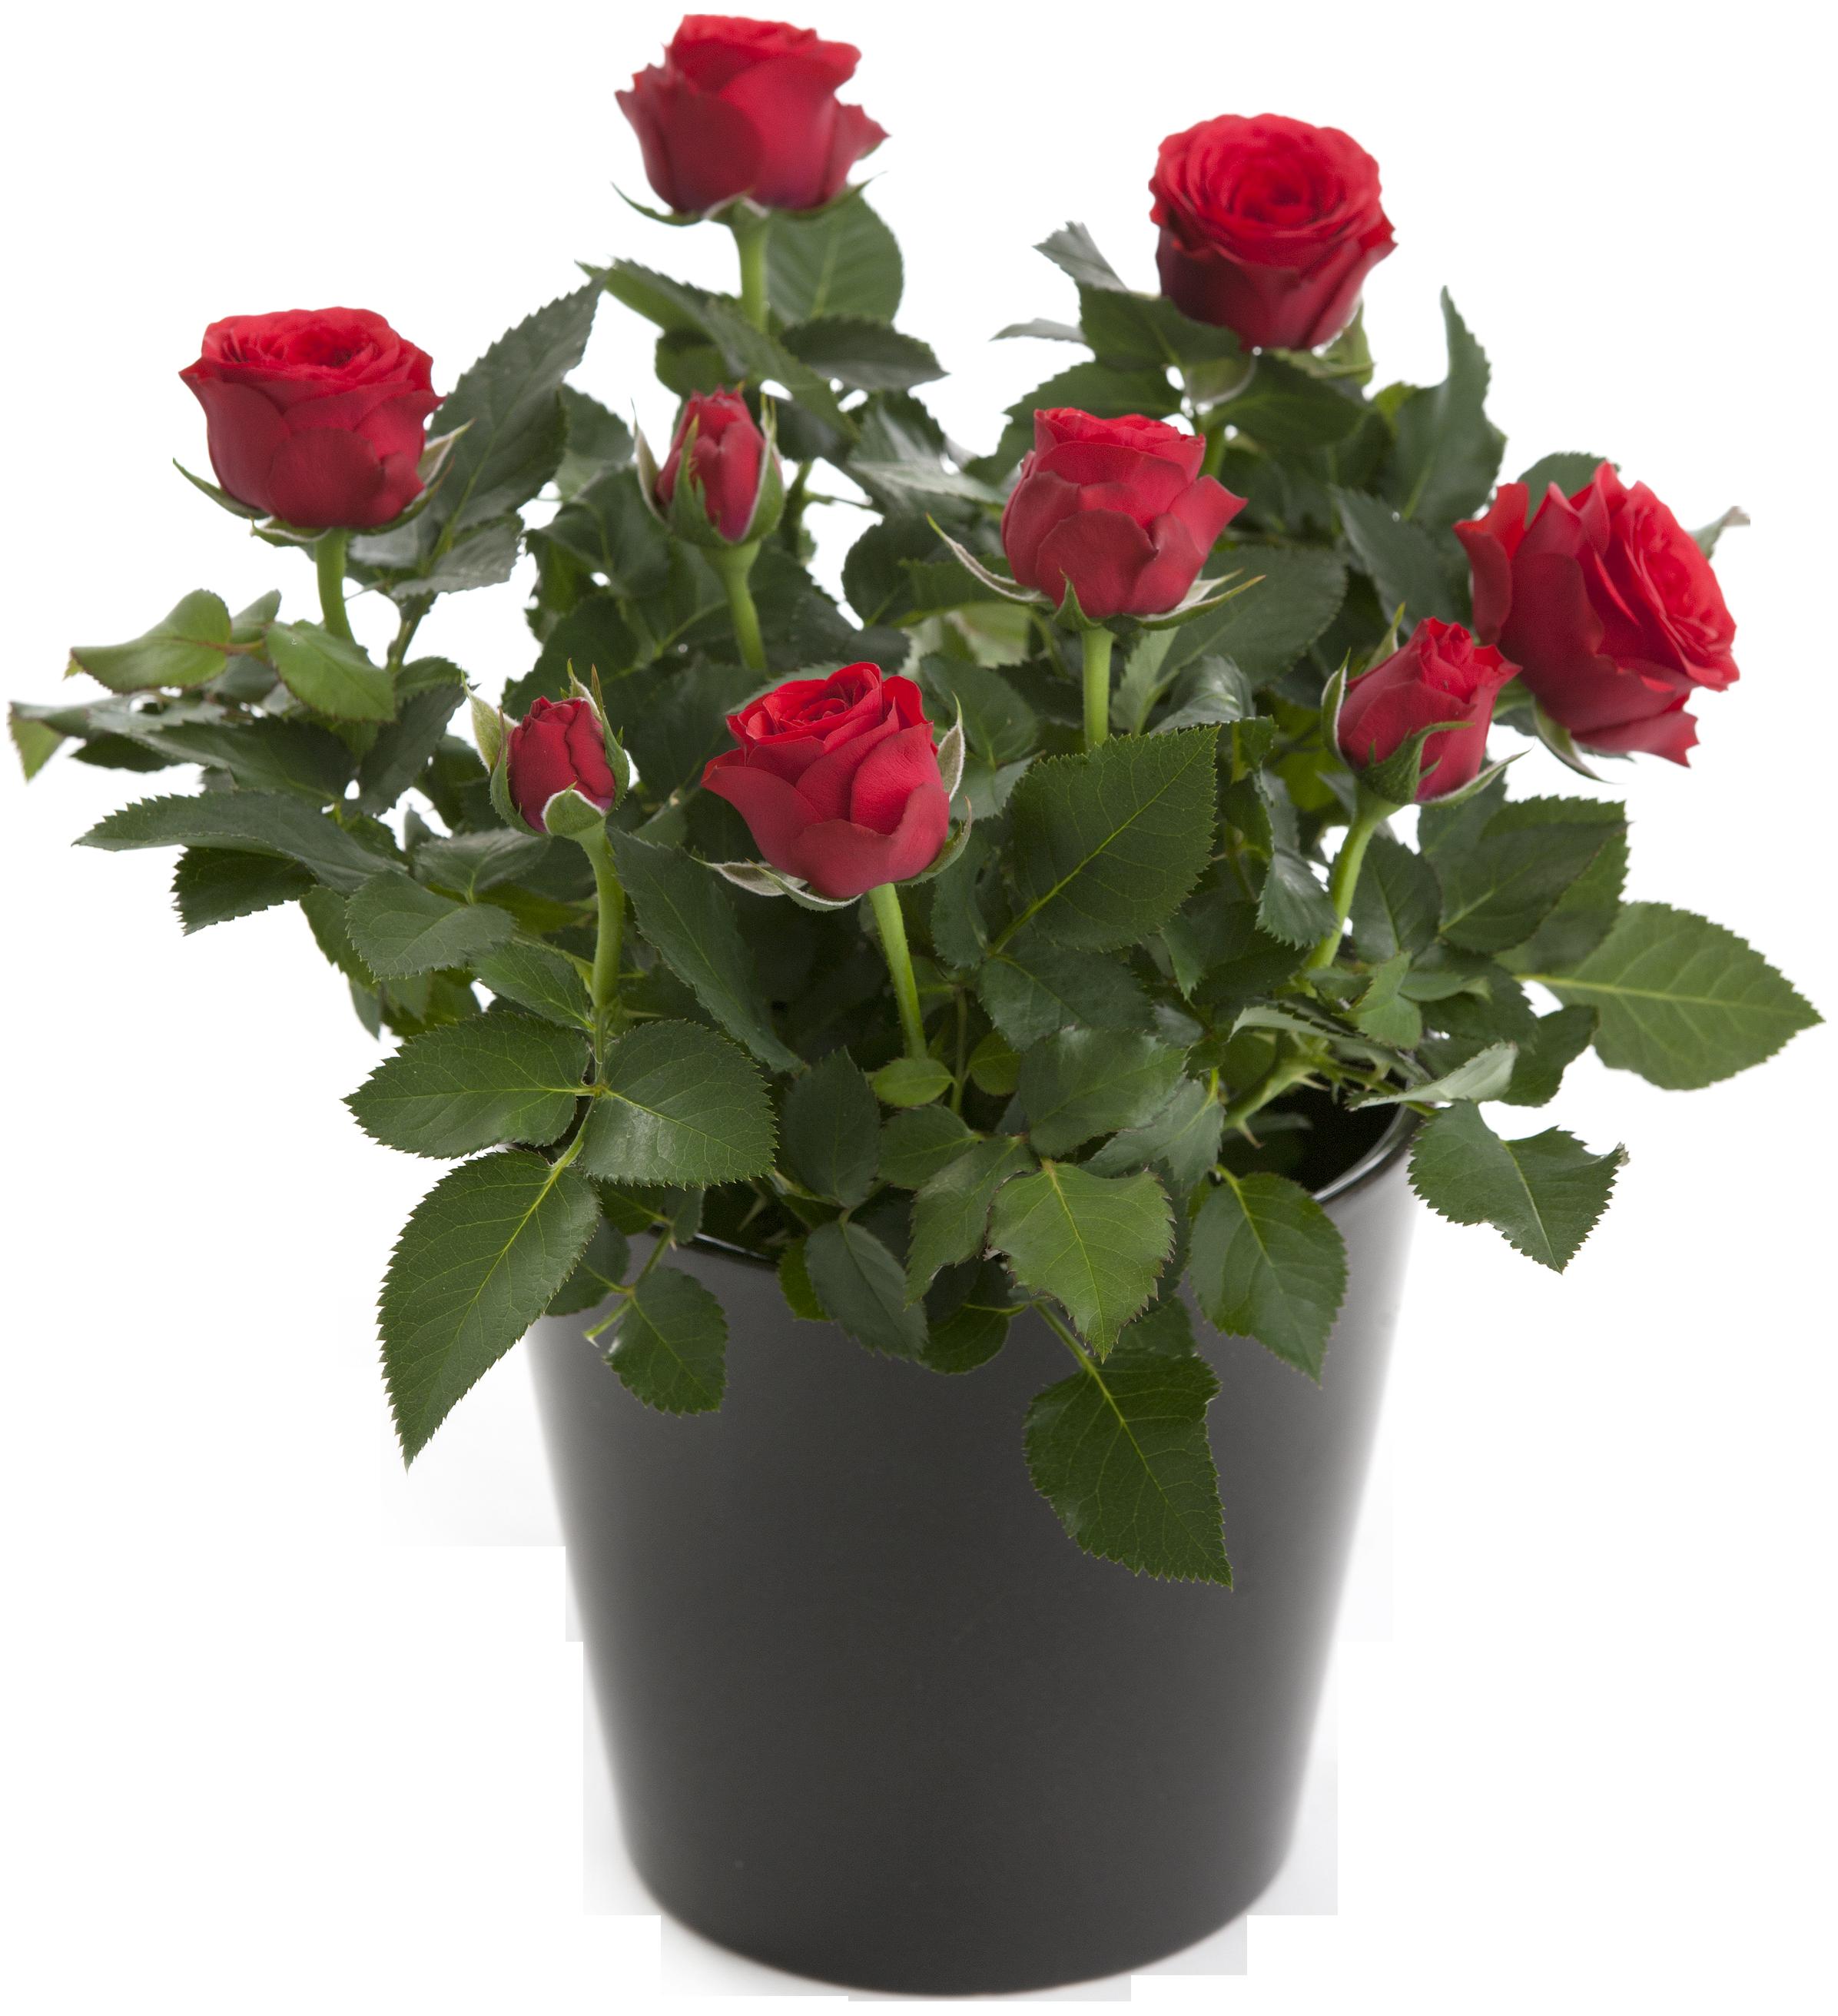 Роза пинк флойд (pink floyd) — характеристики сорта